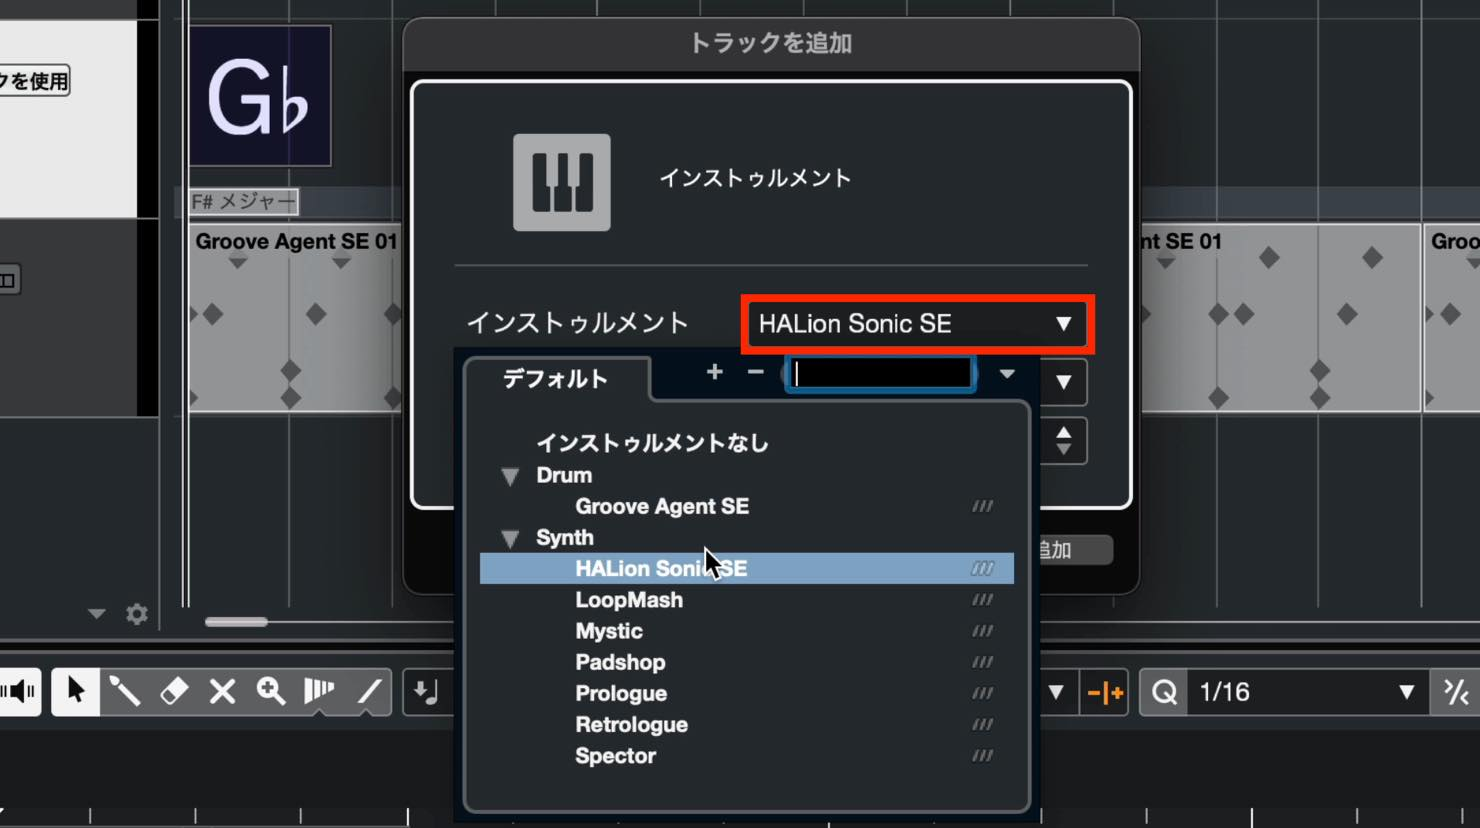 select HALion